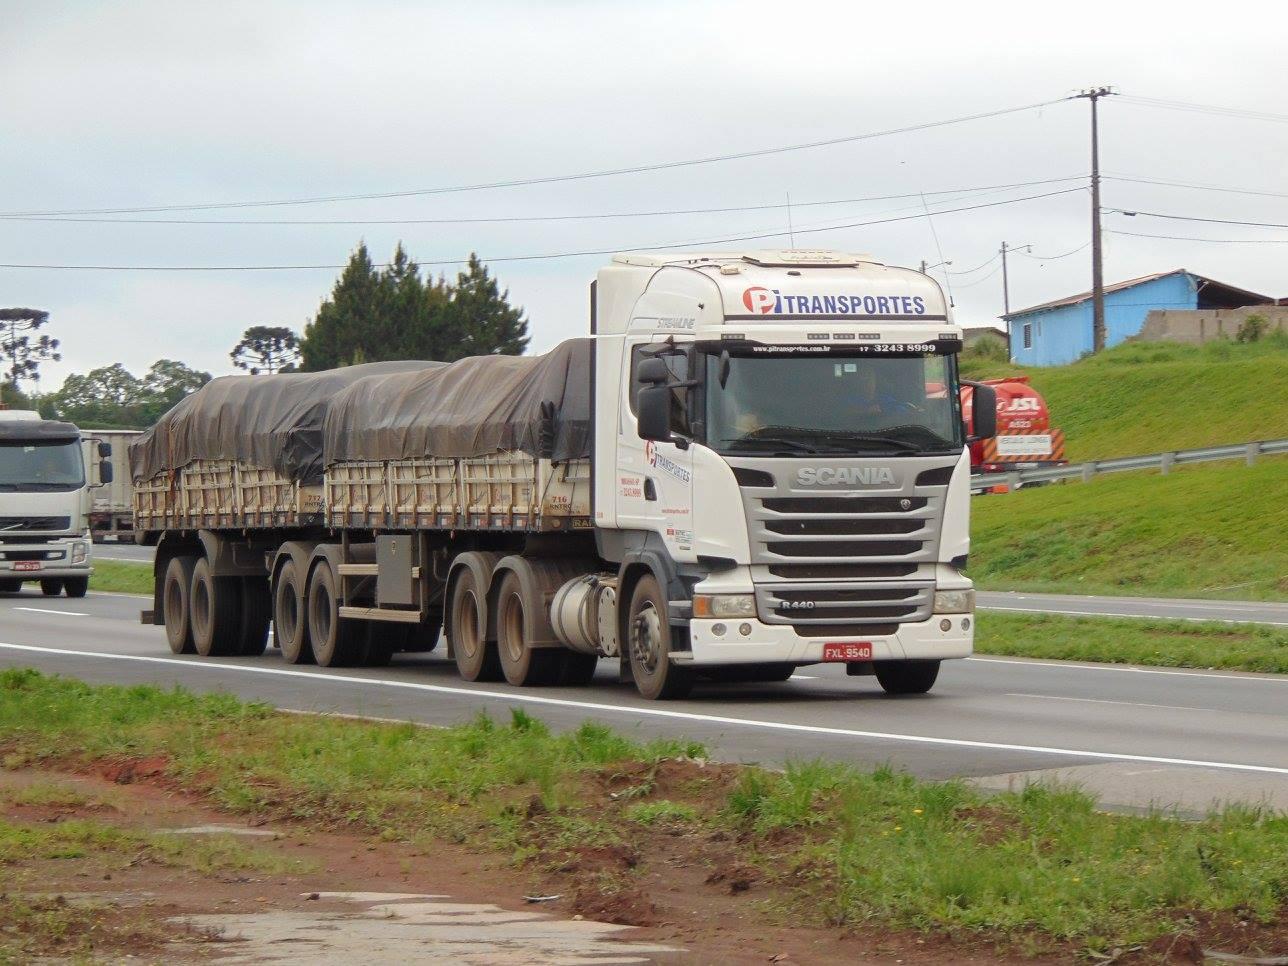 Scania-photo-5-1--2015-2